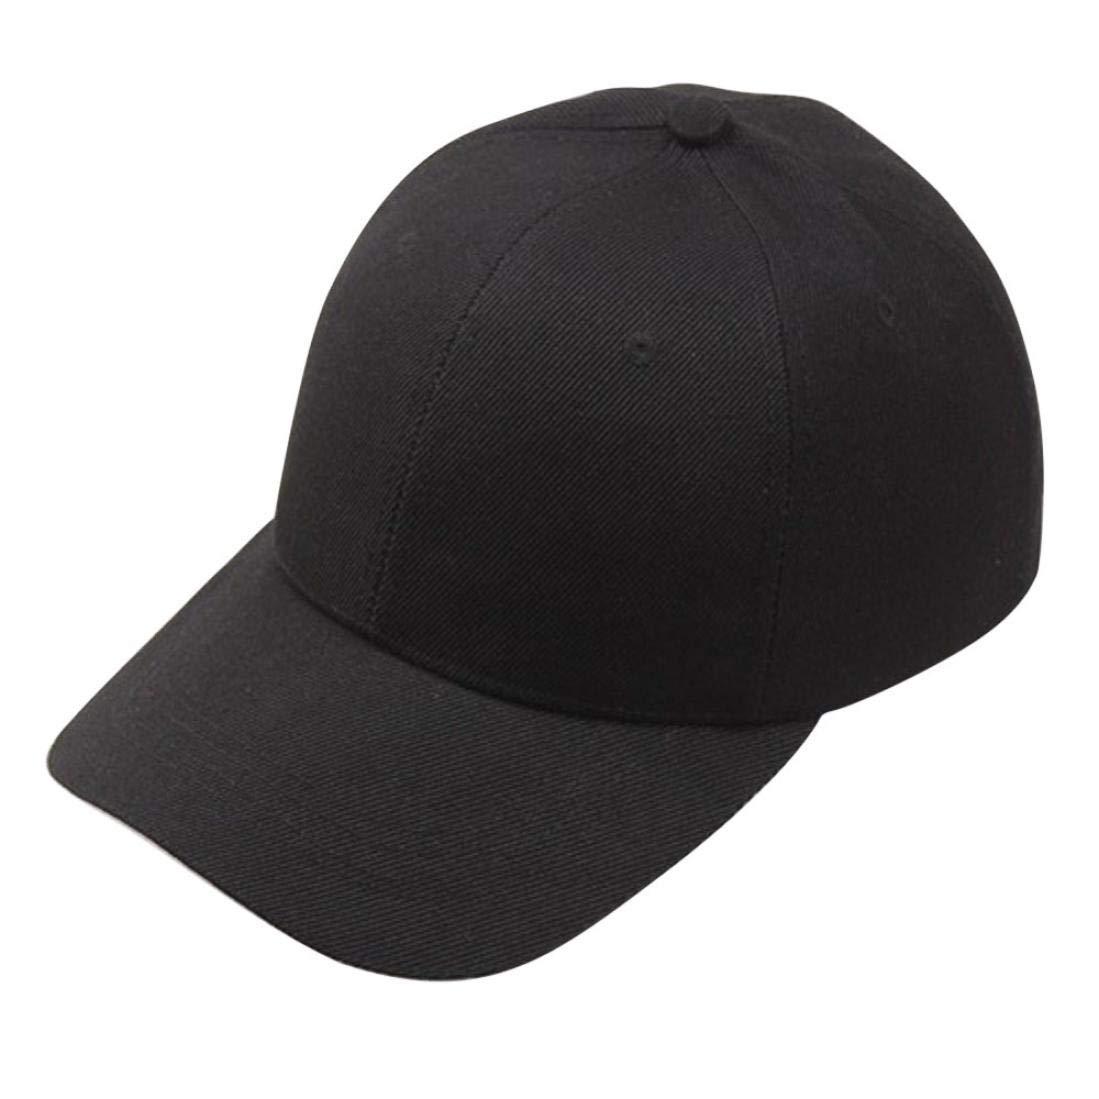 Men Women Couple Simple Solid Baseball Cap Snapback Hat Strapback Cap Peaked Hat (Black, Adjustable)